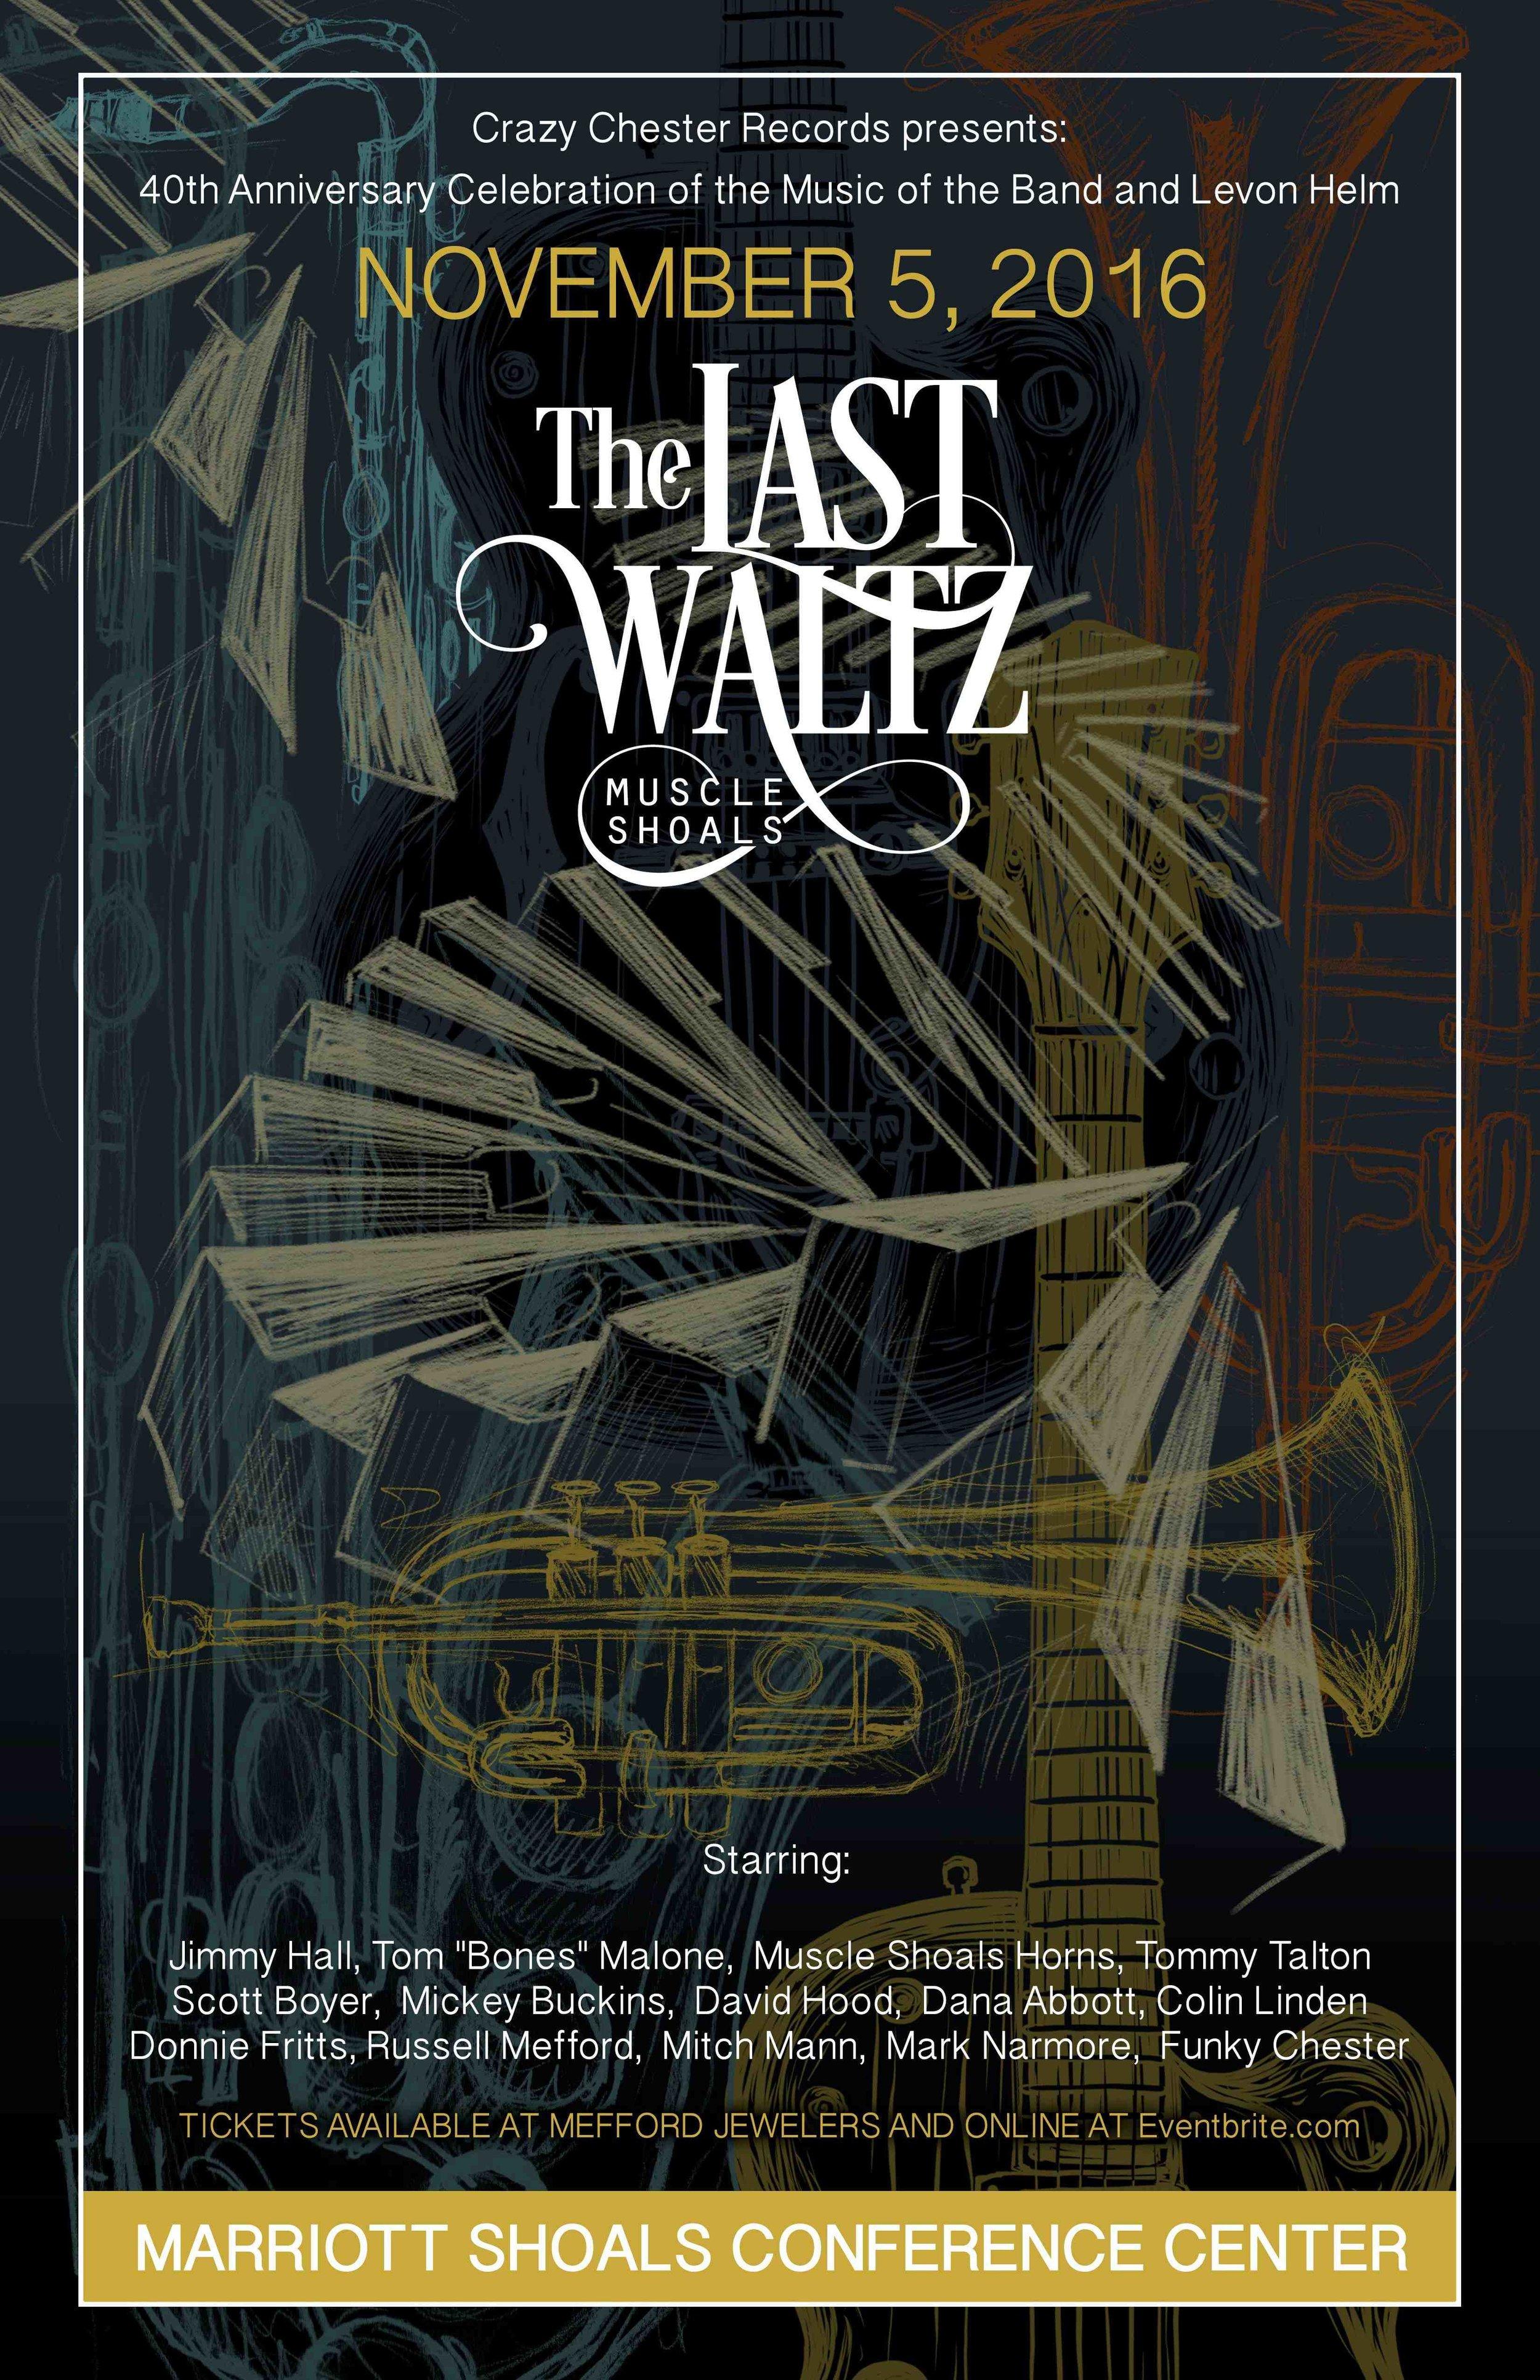 last-waltz-muscle-shoals-poster